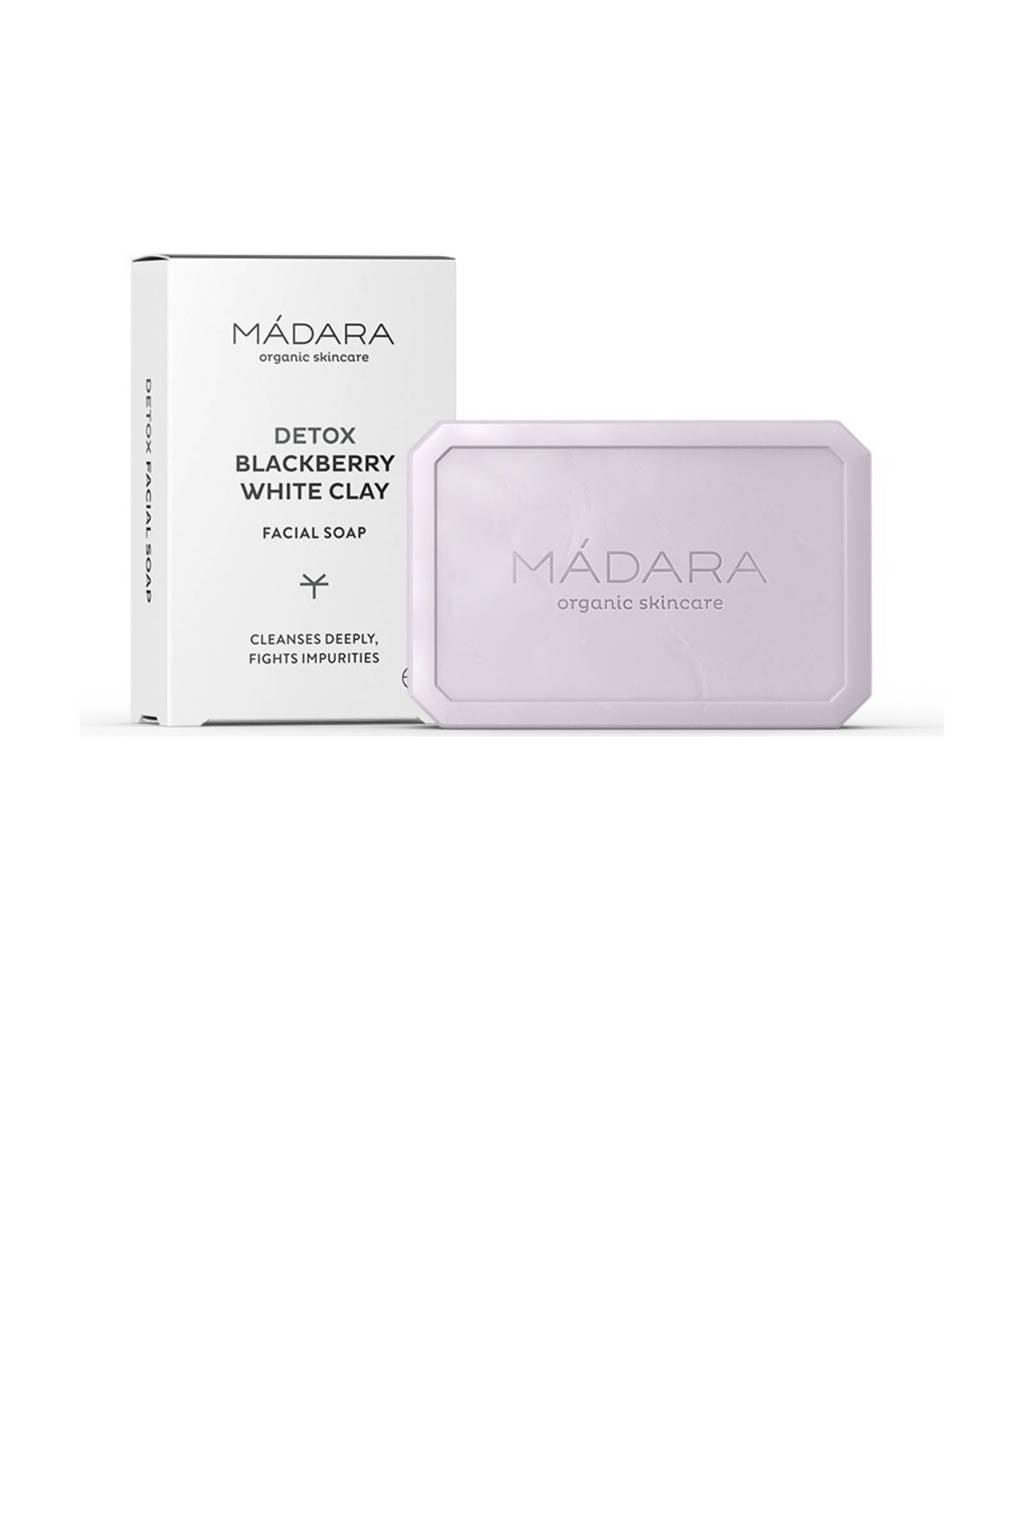 Mádara DETOX Blackberry and White Clay soap